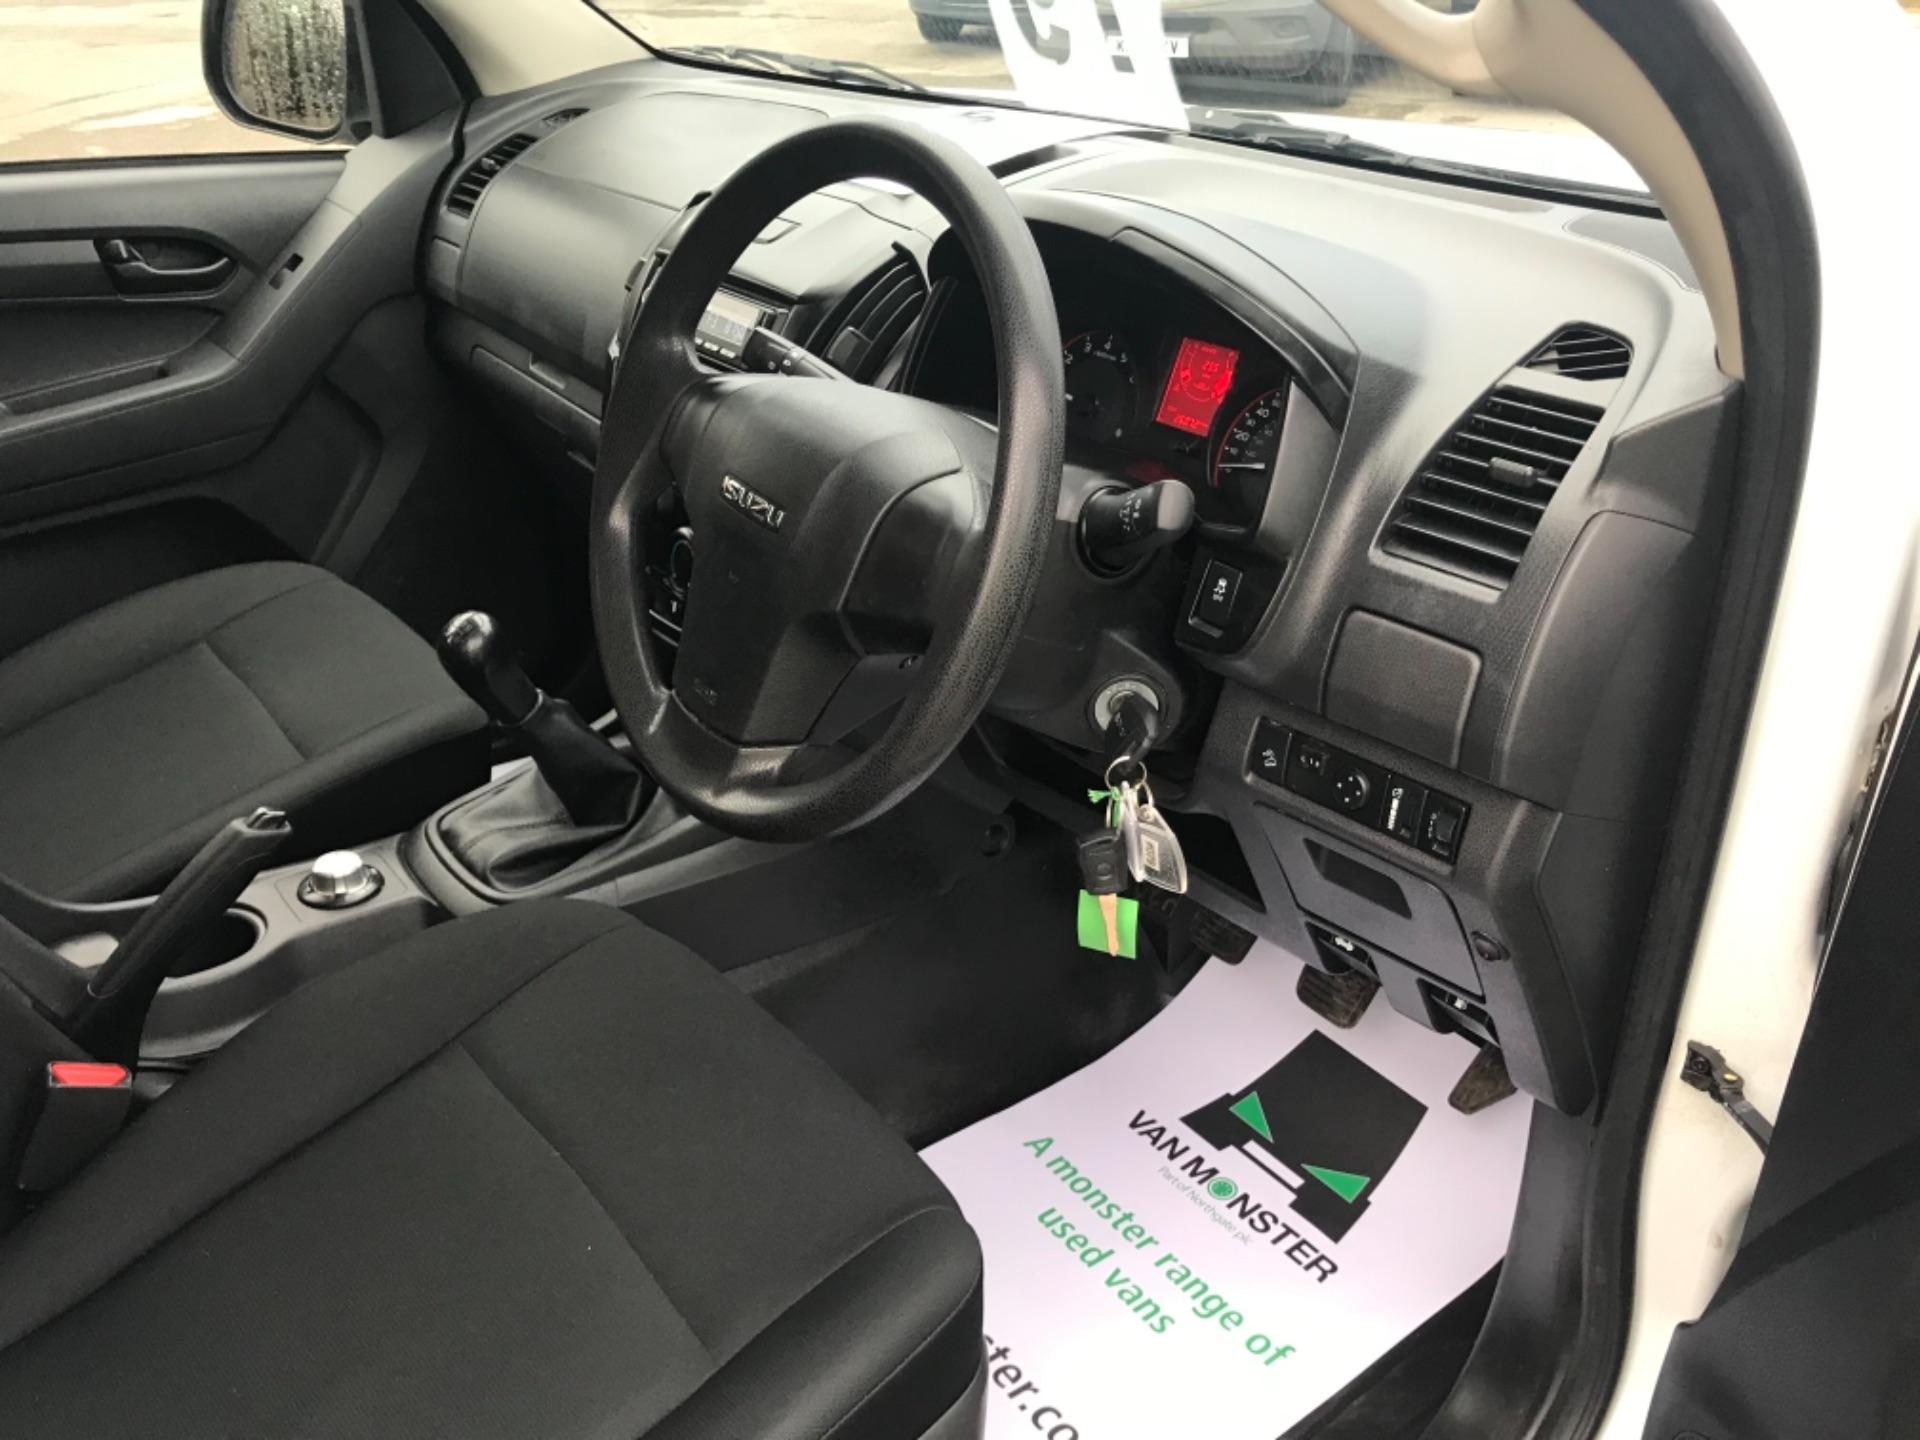 2018 Isuzu D-Max 1.9 Double Cab 4X4 (YG18FZJ) Image 6